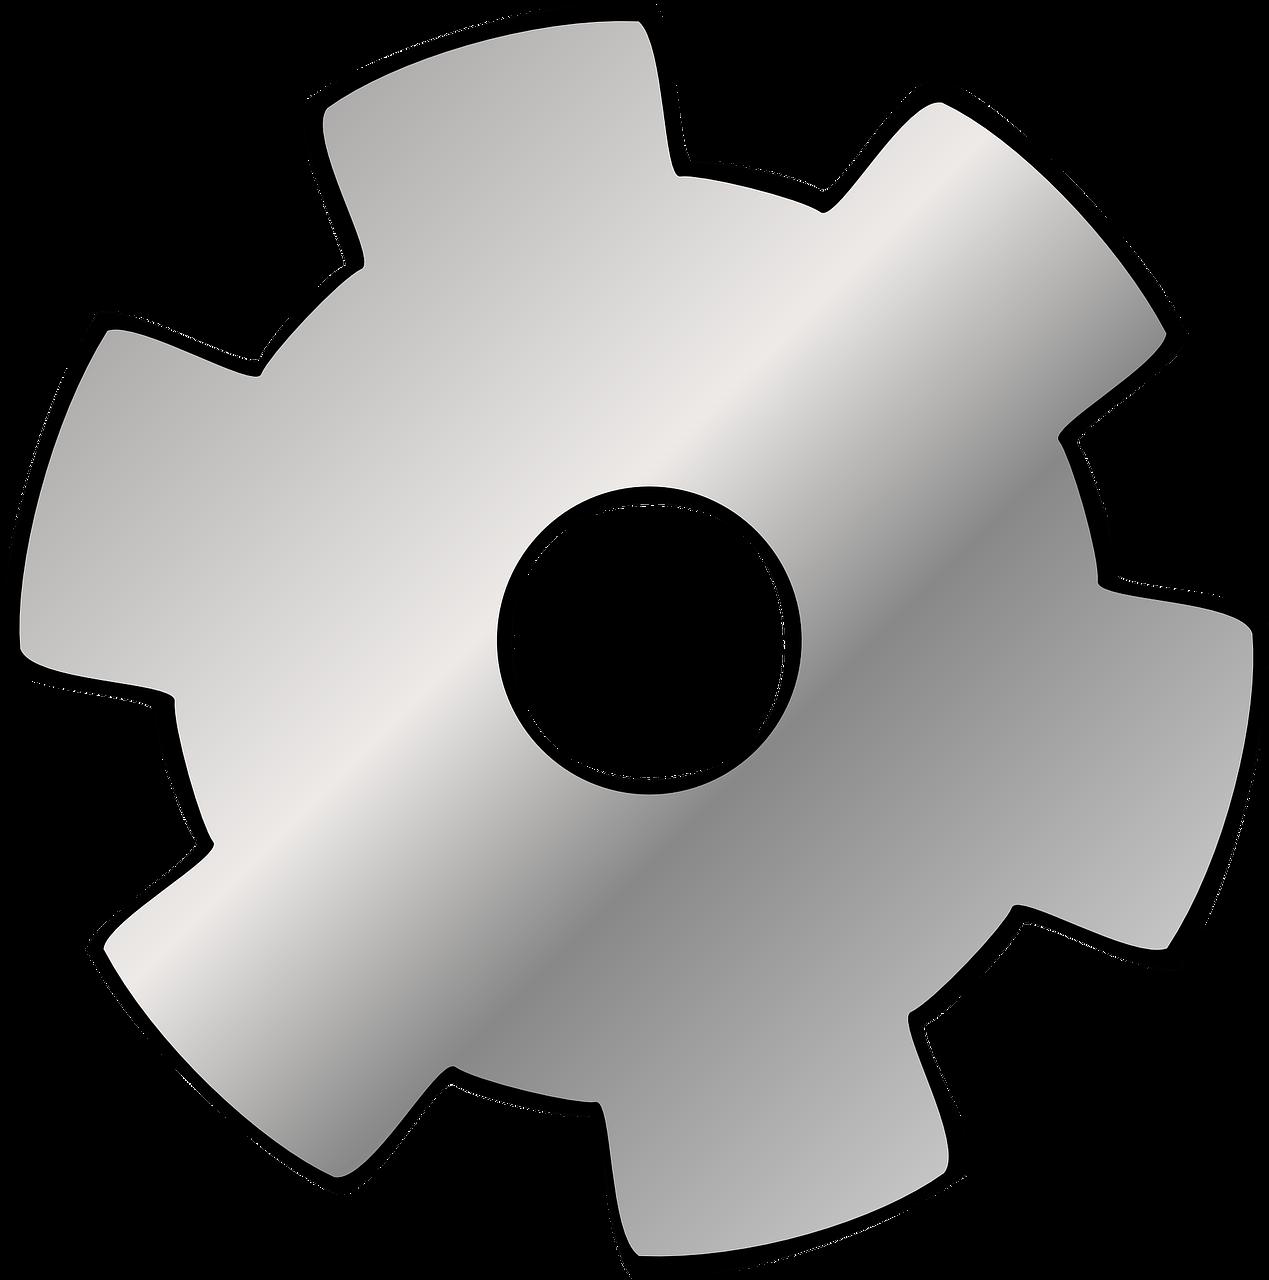 Gears clipart gear shape. Cog wheel chrome transparent